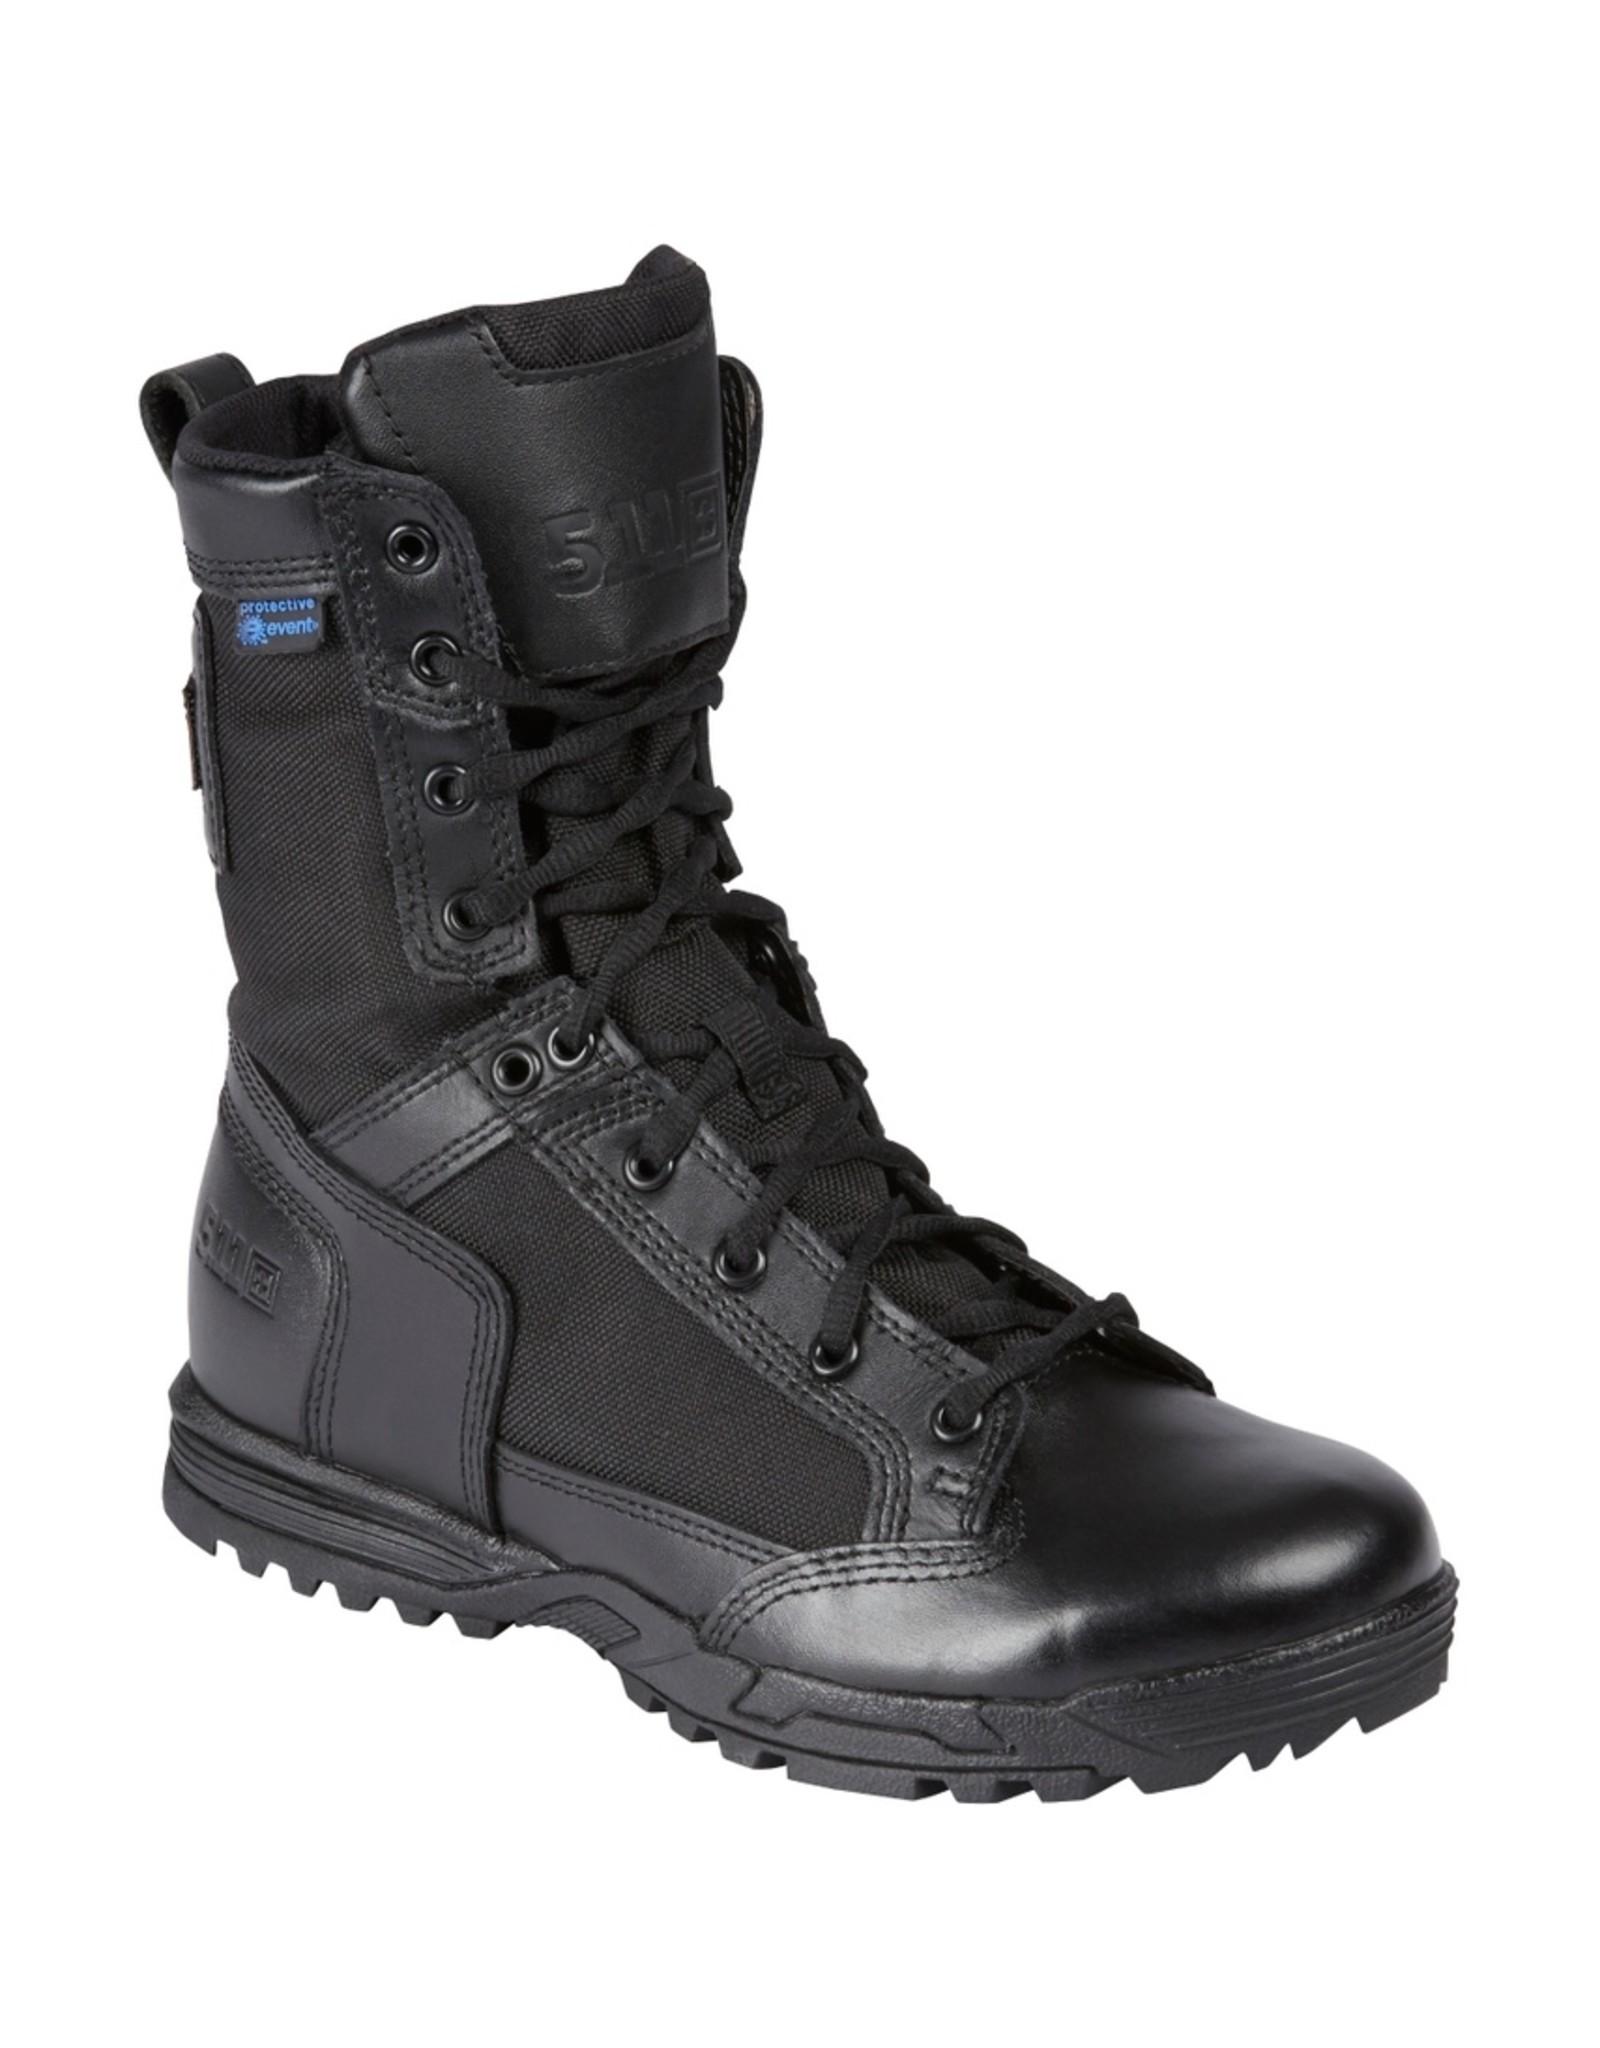 5.11 Skyweight WP z/Zip Boot